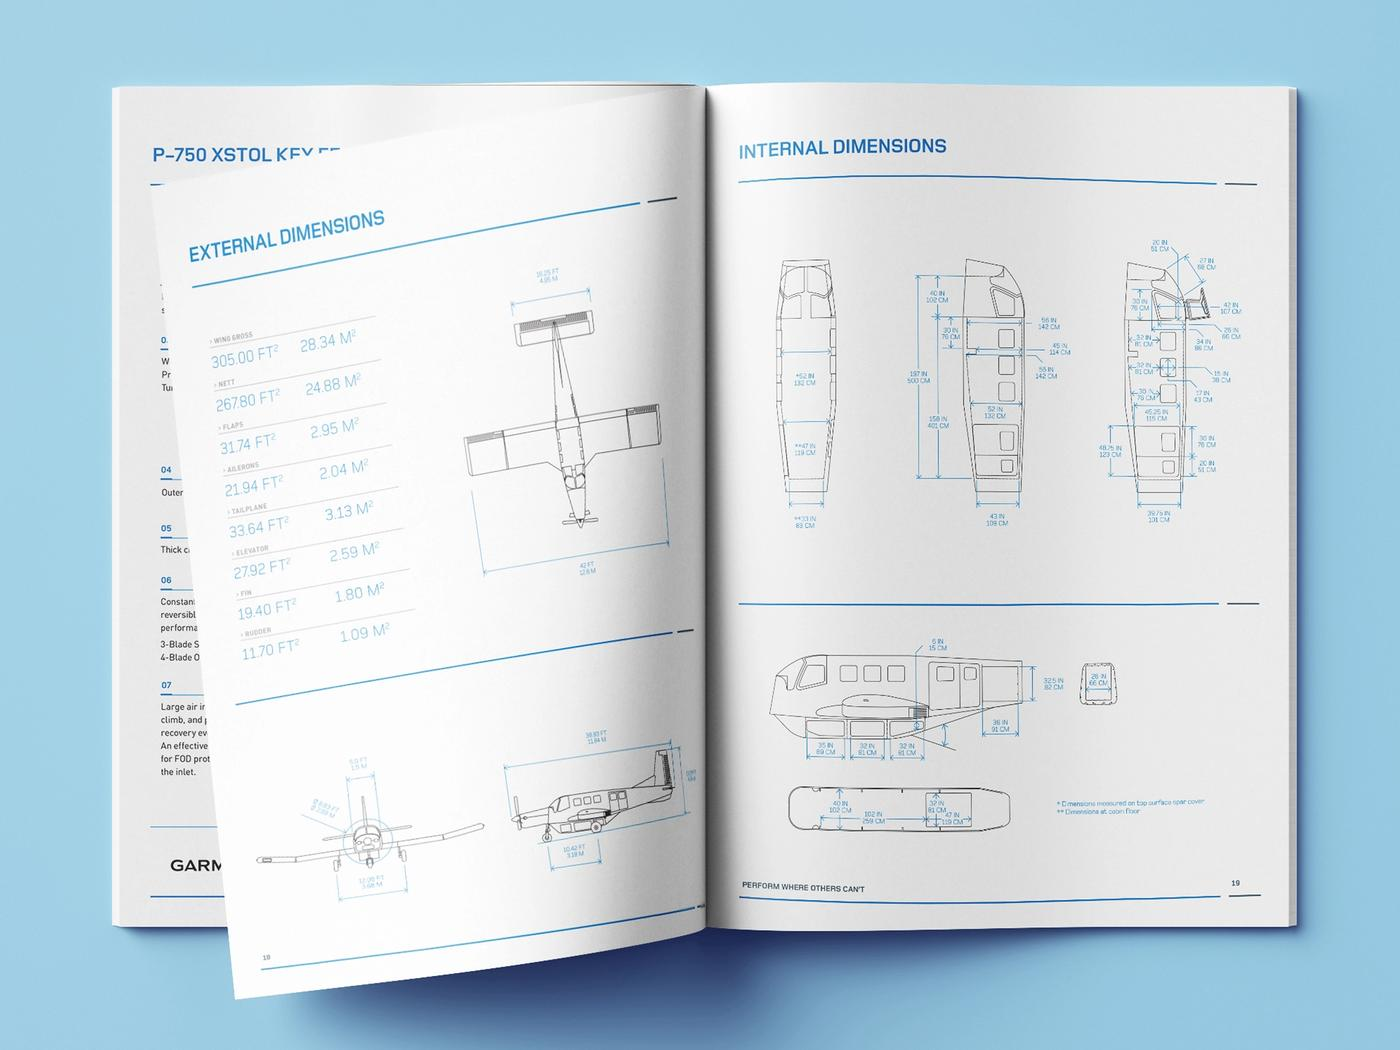 Pacific Aerospace profile document diagrams page